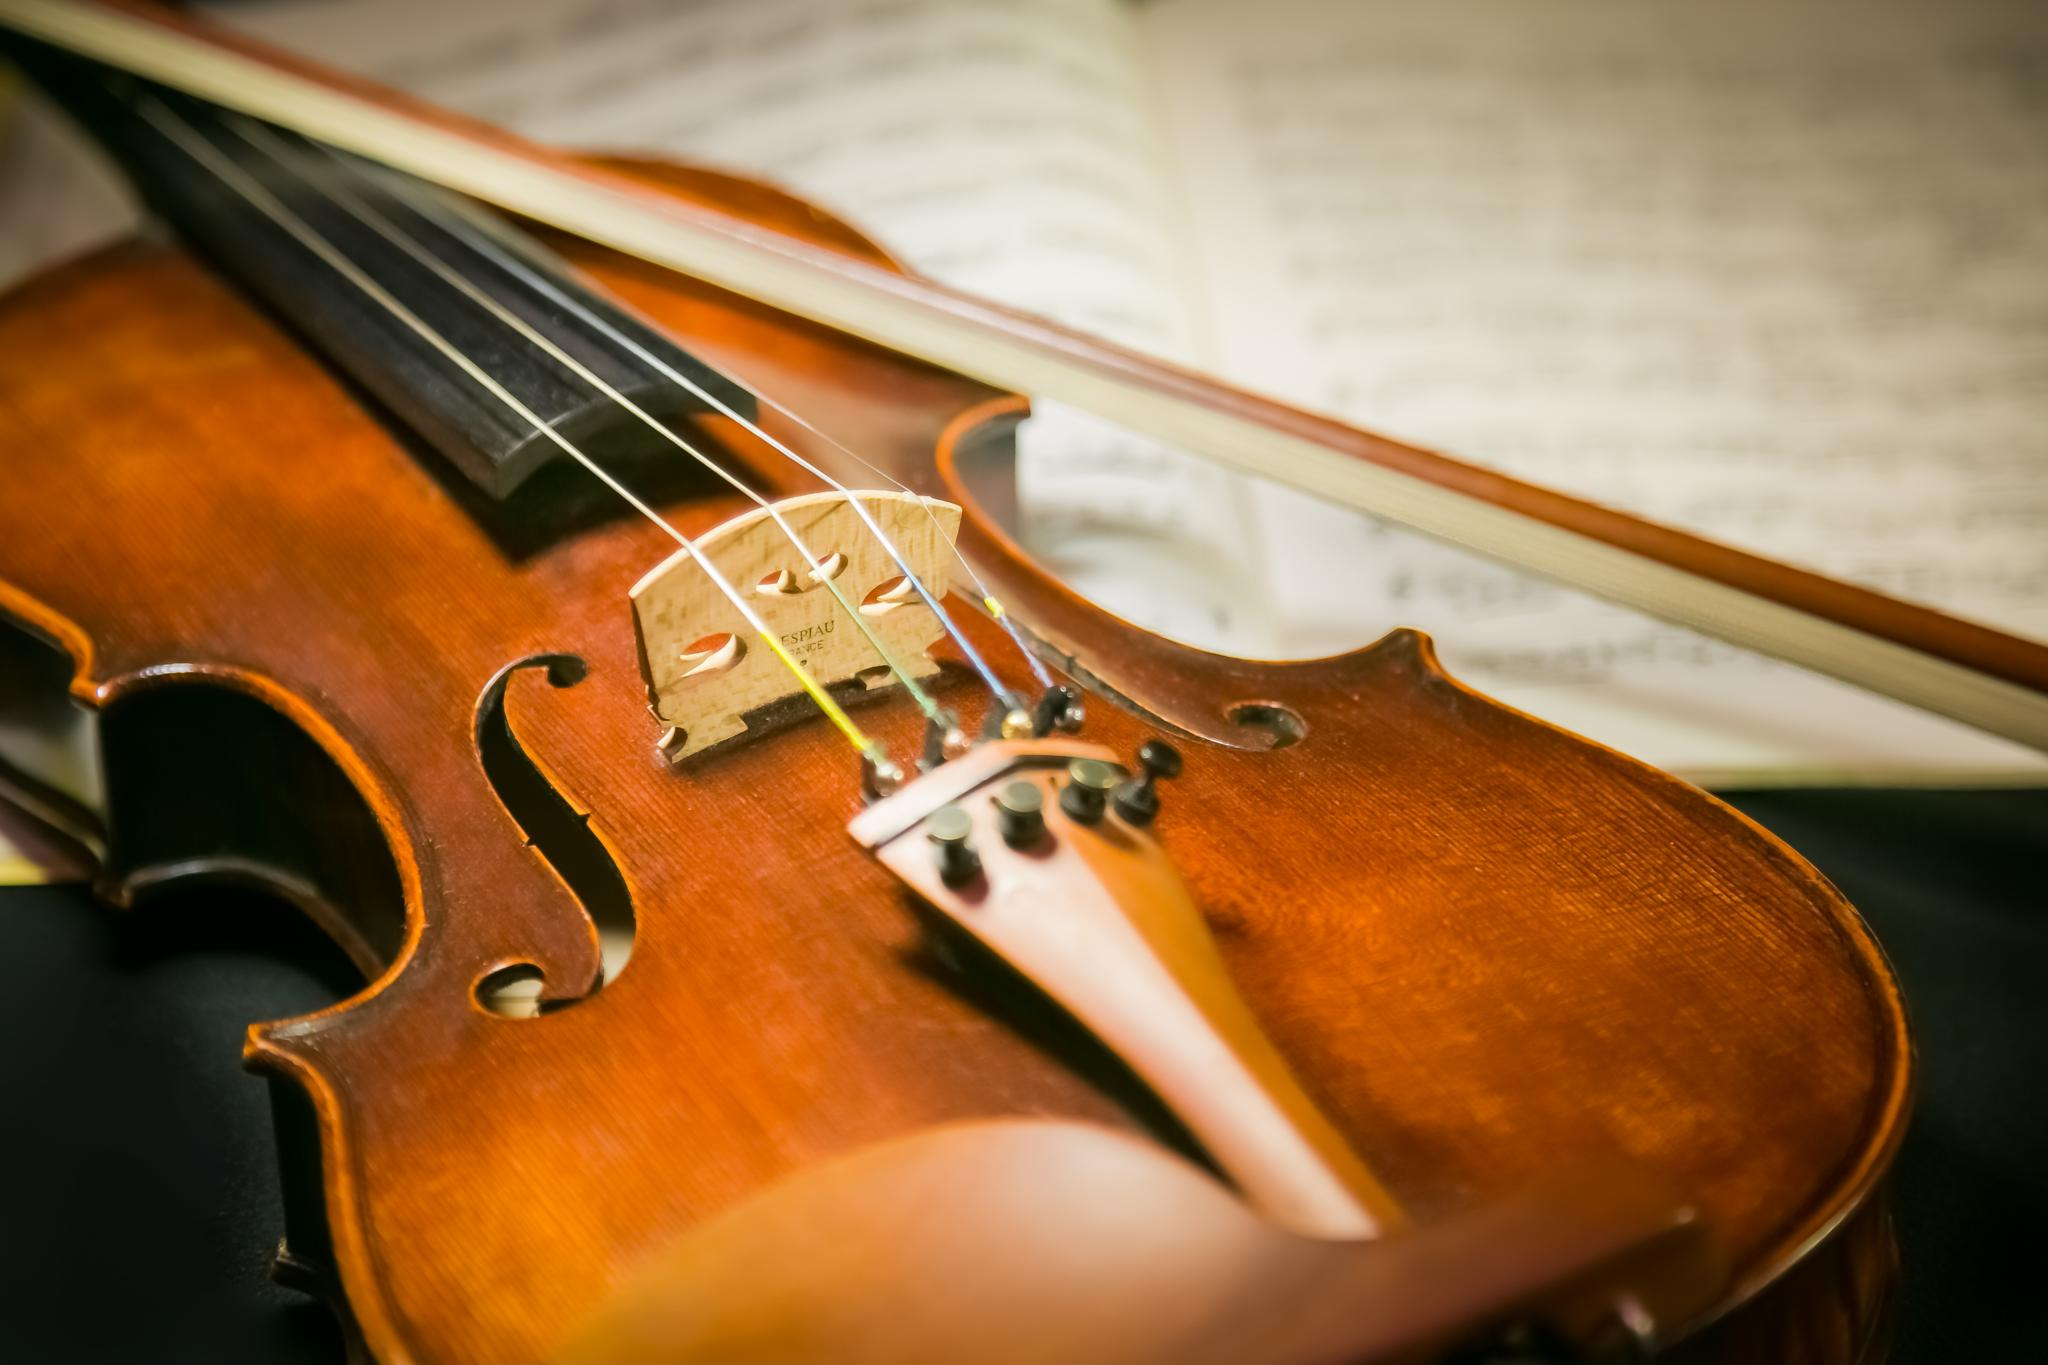 Violin by Cary Chu